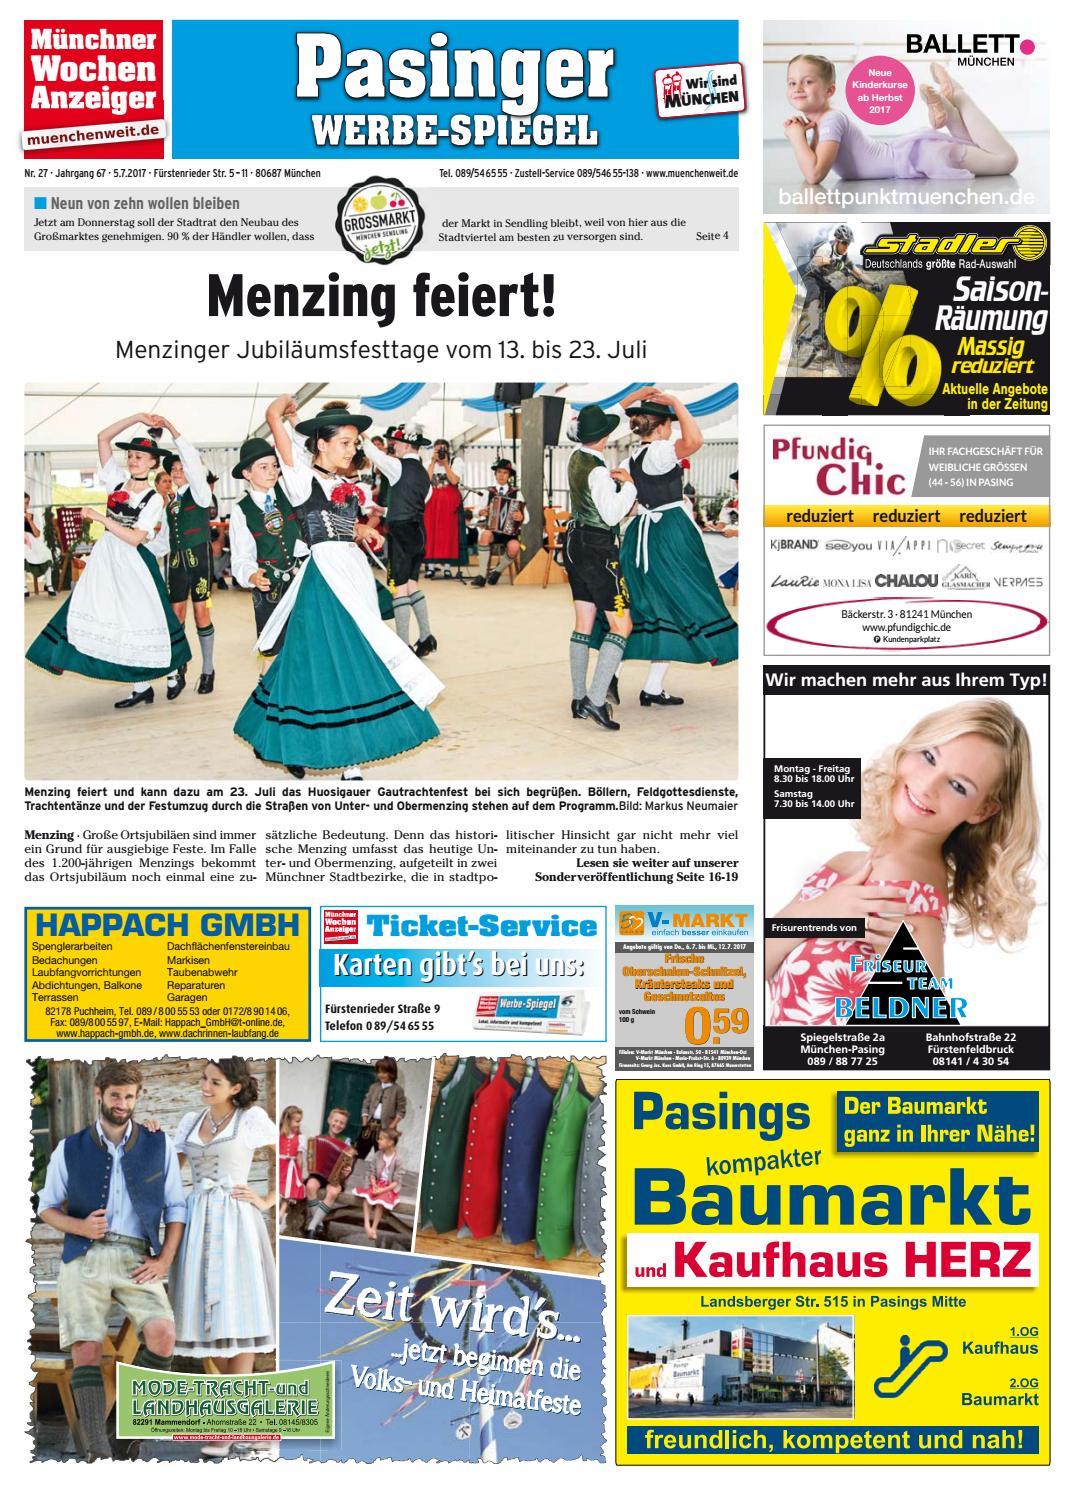 elite escort germany erotic markt regensburg